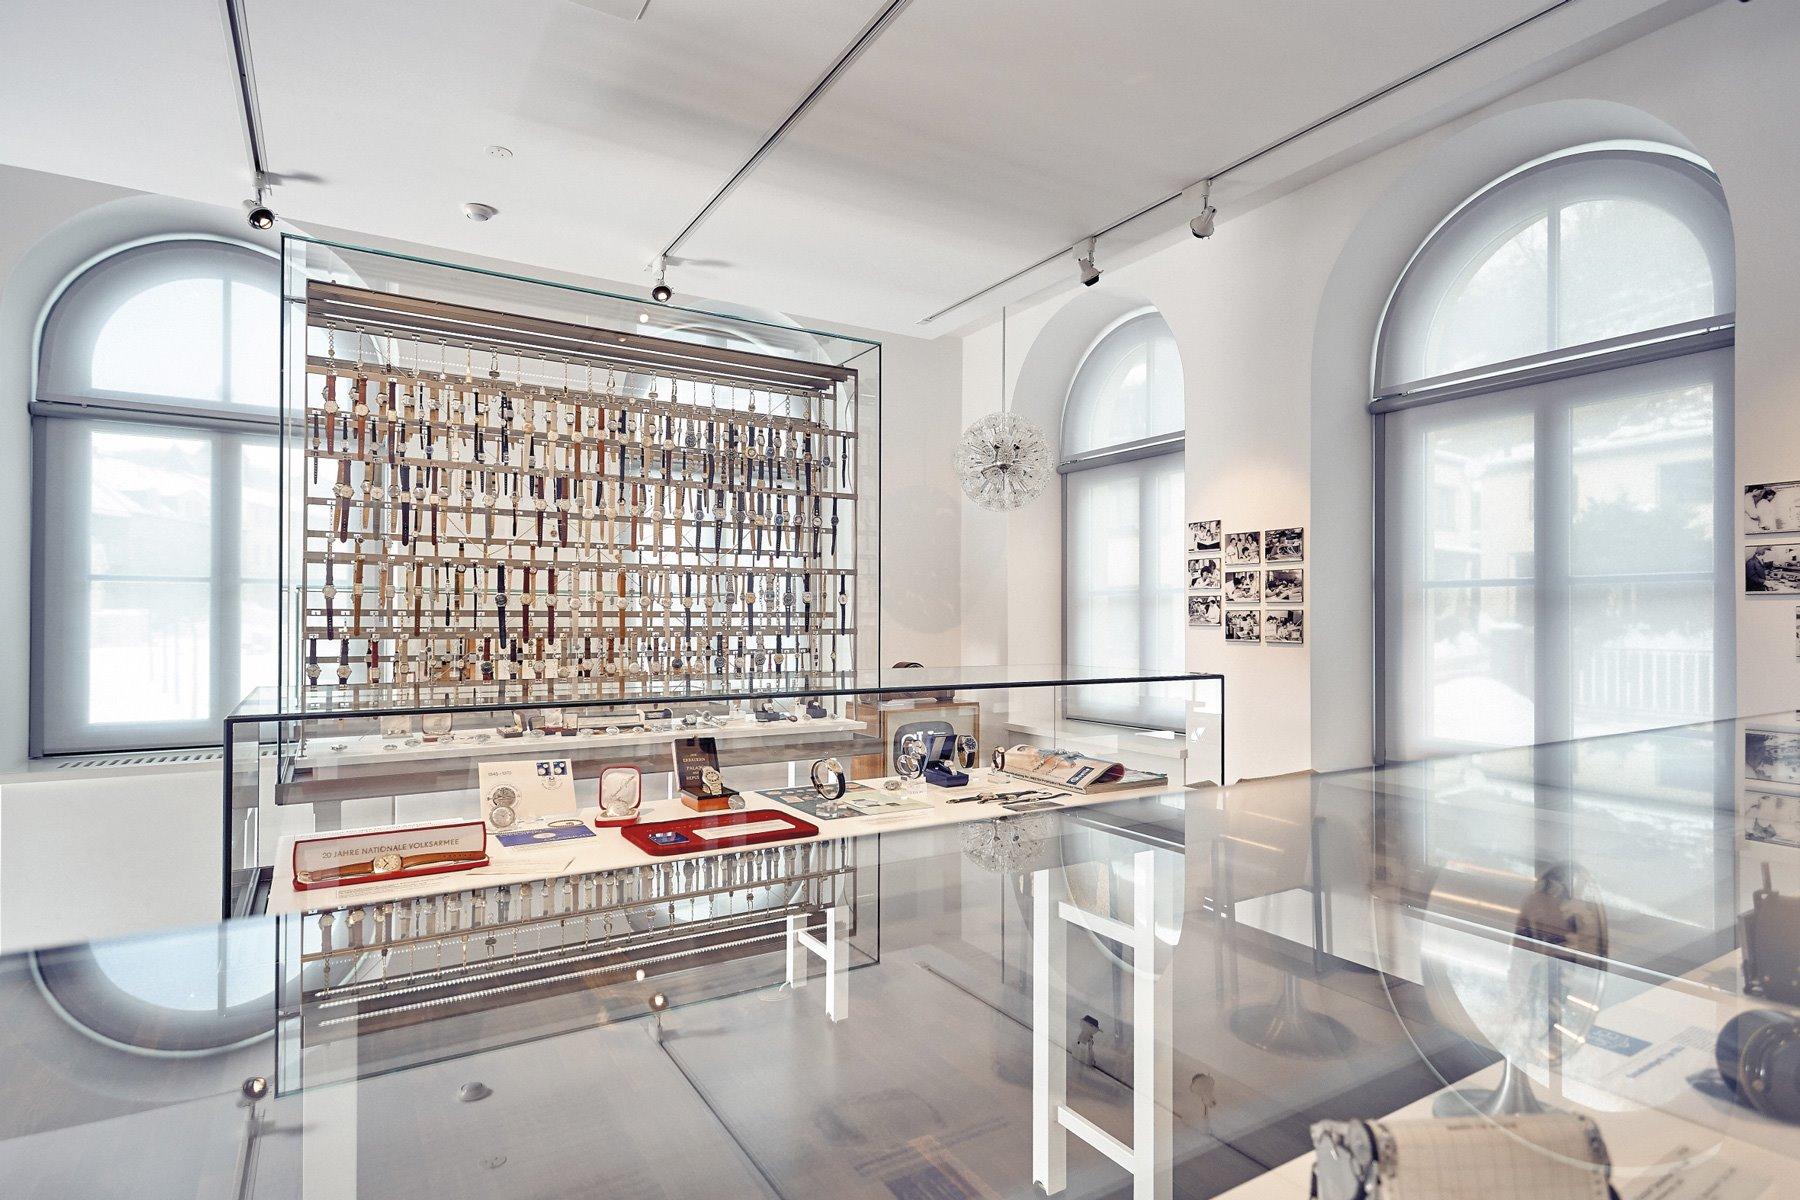 Museo alemán del reloj Glashütte